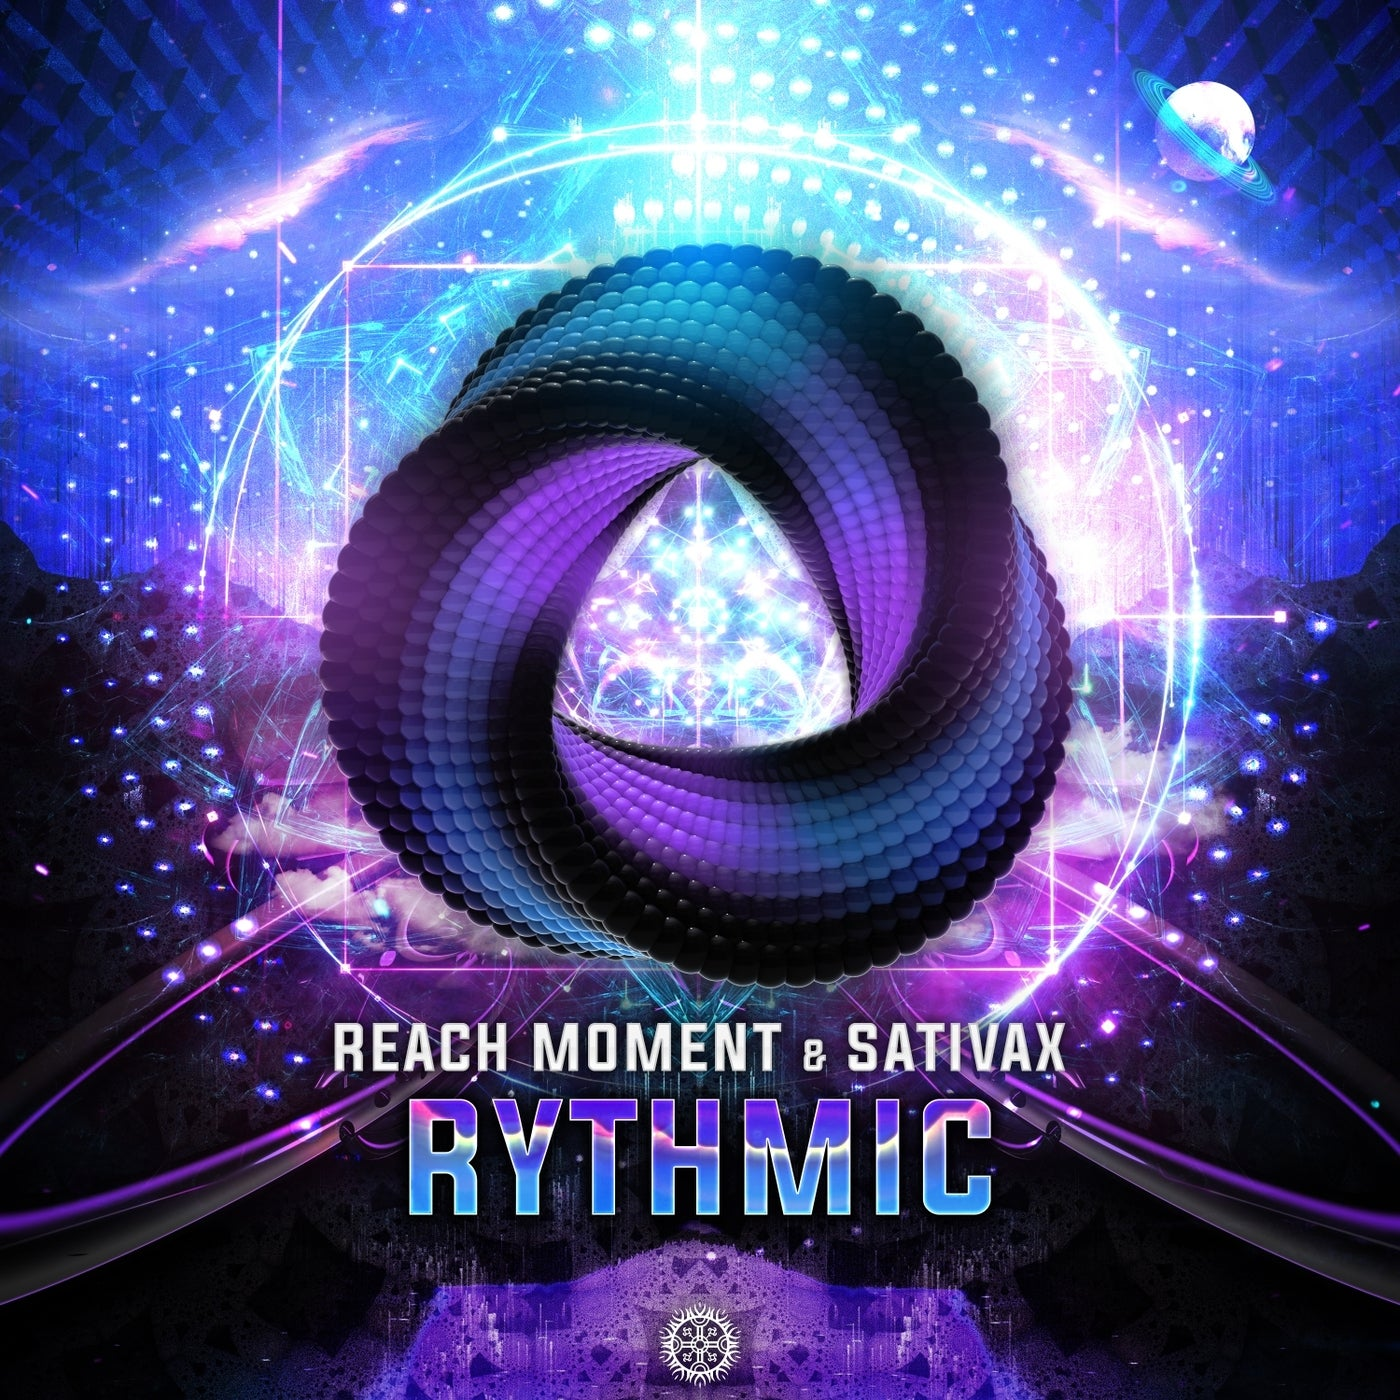 Rythmic (Original Mix)